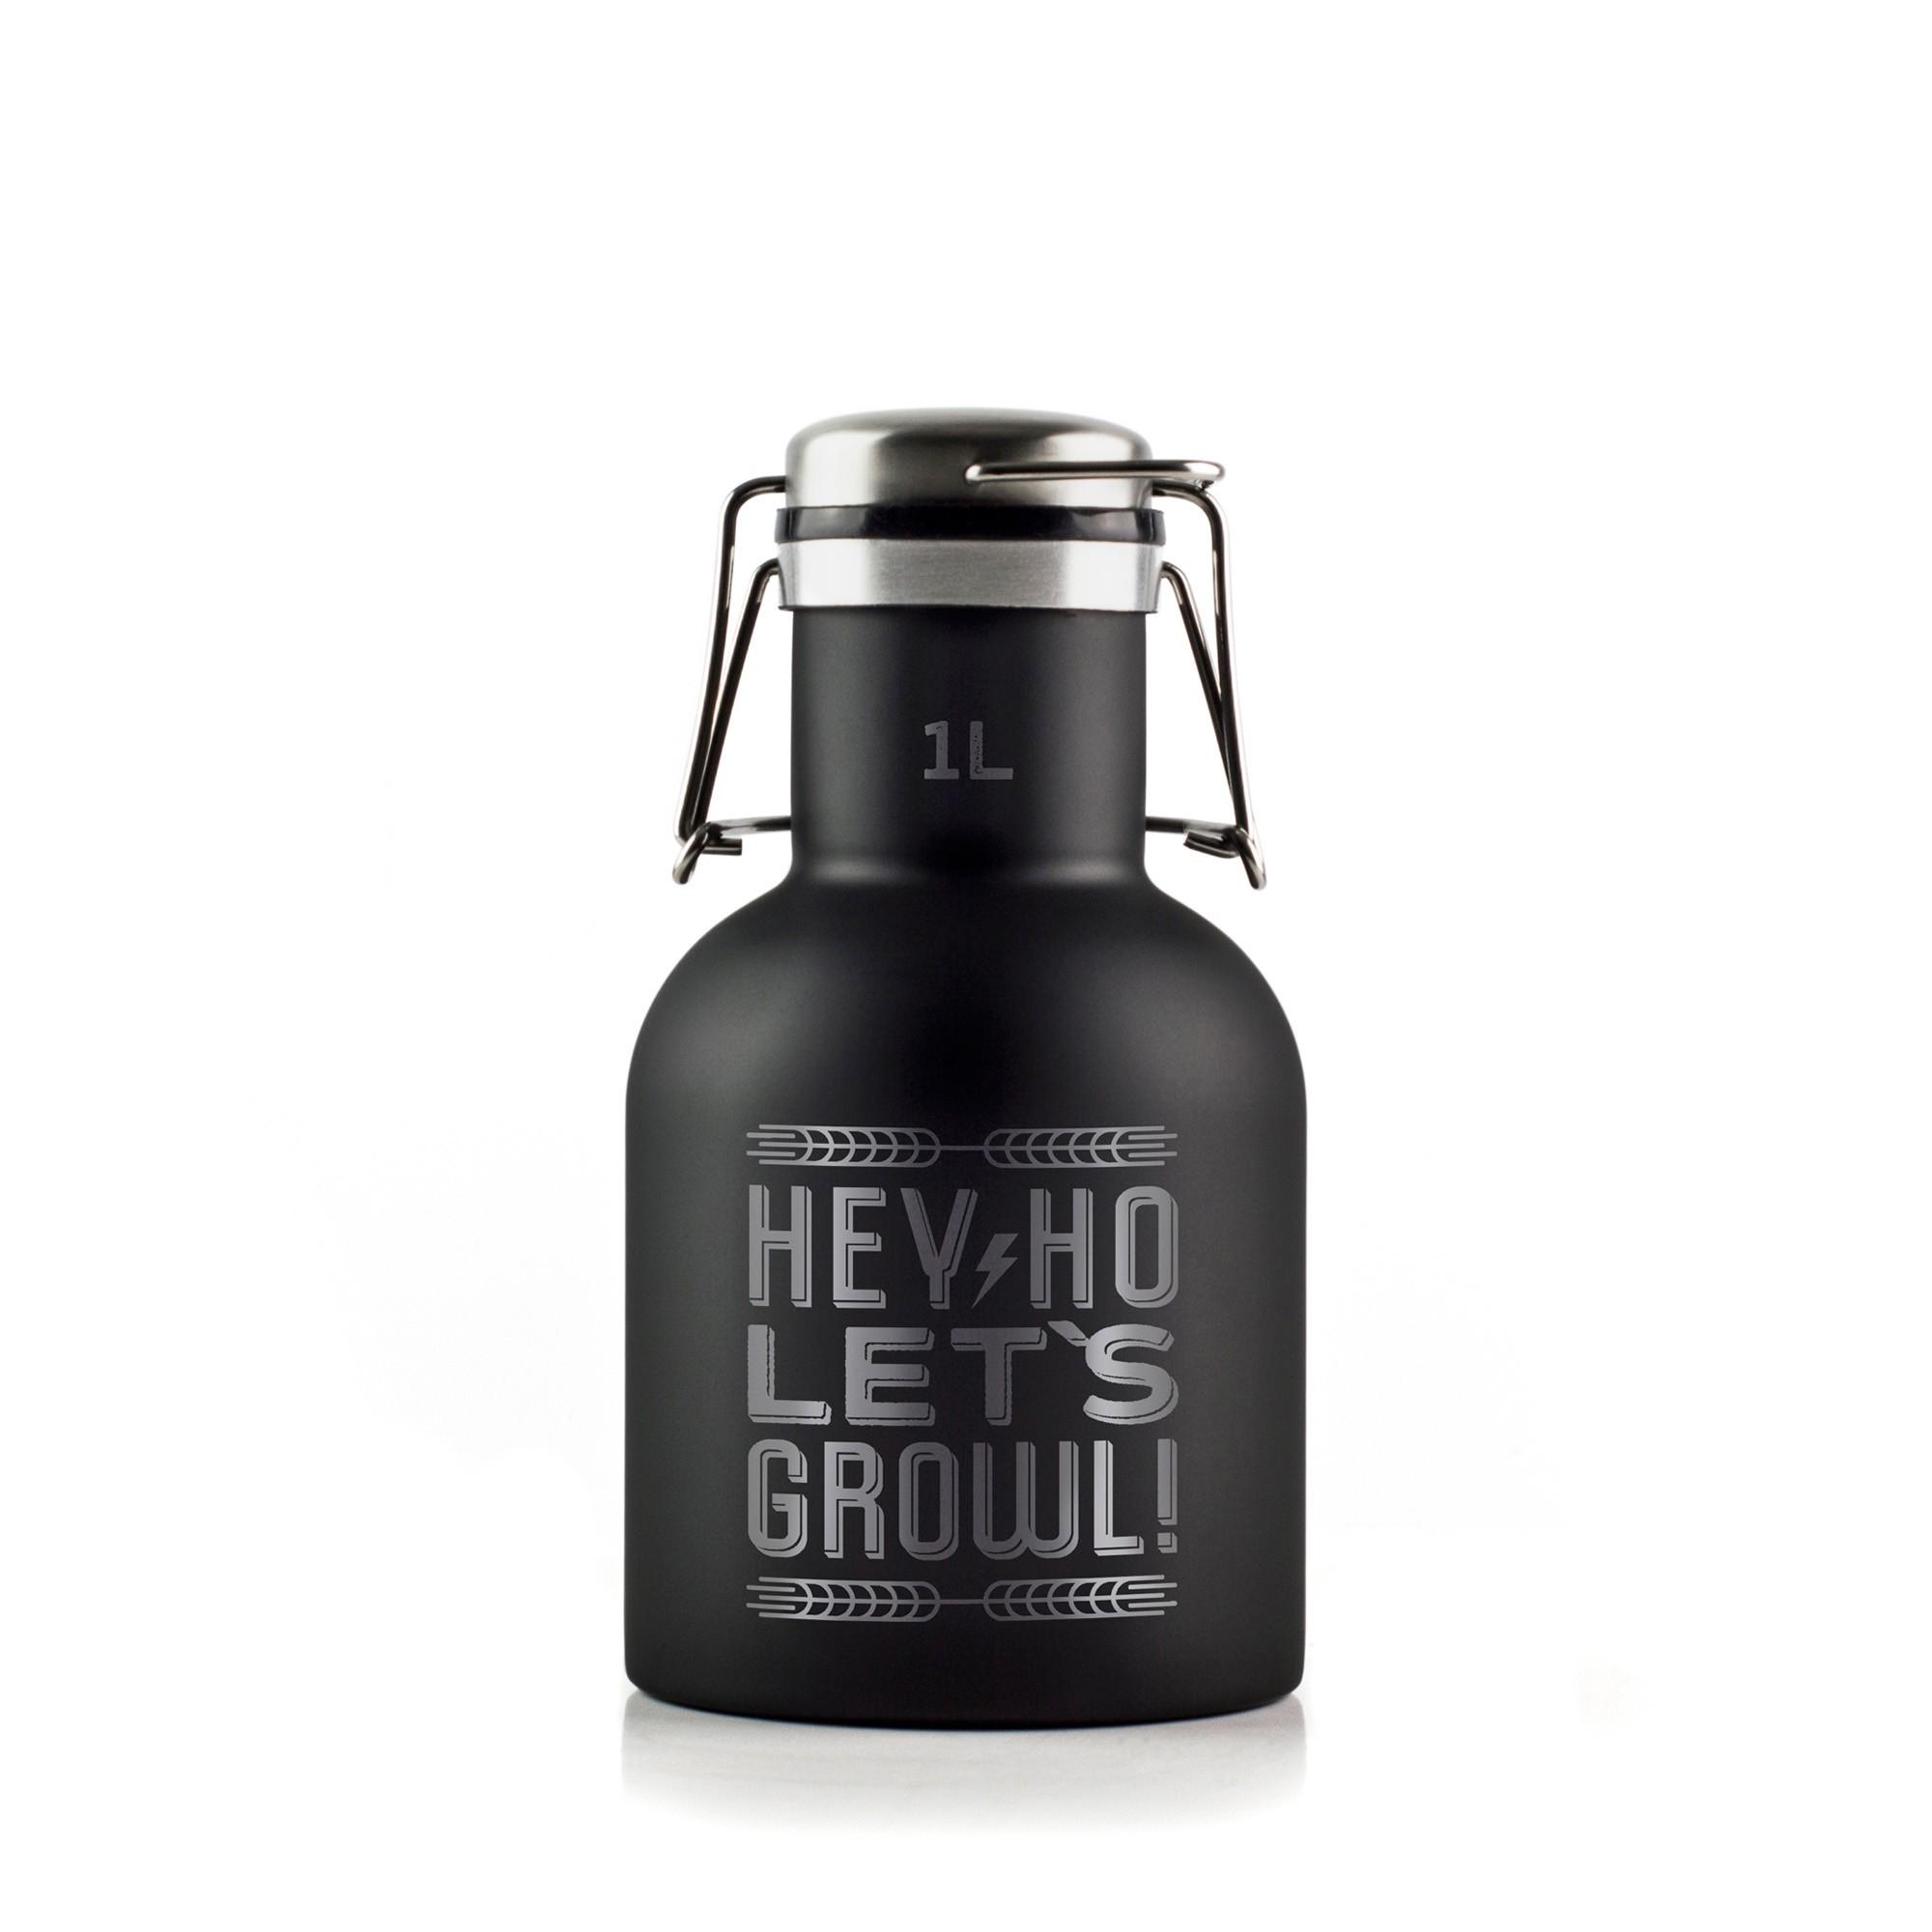 Growler Inox 1L - Hey Ho!